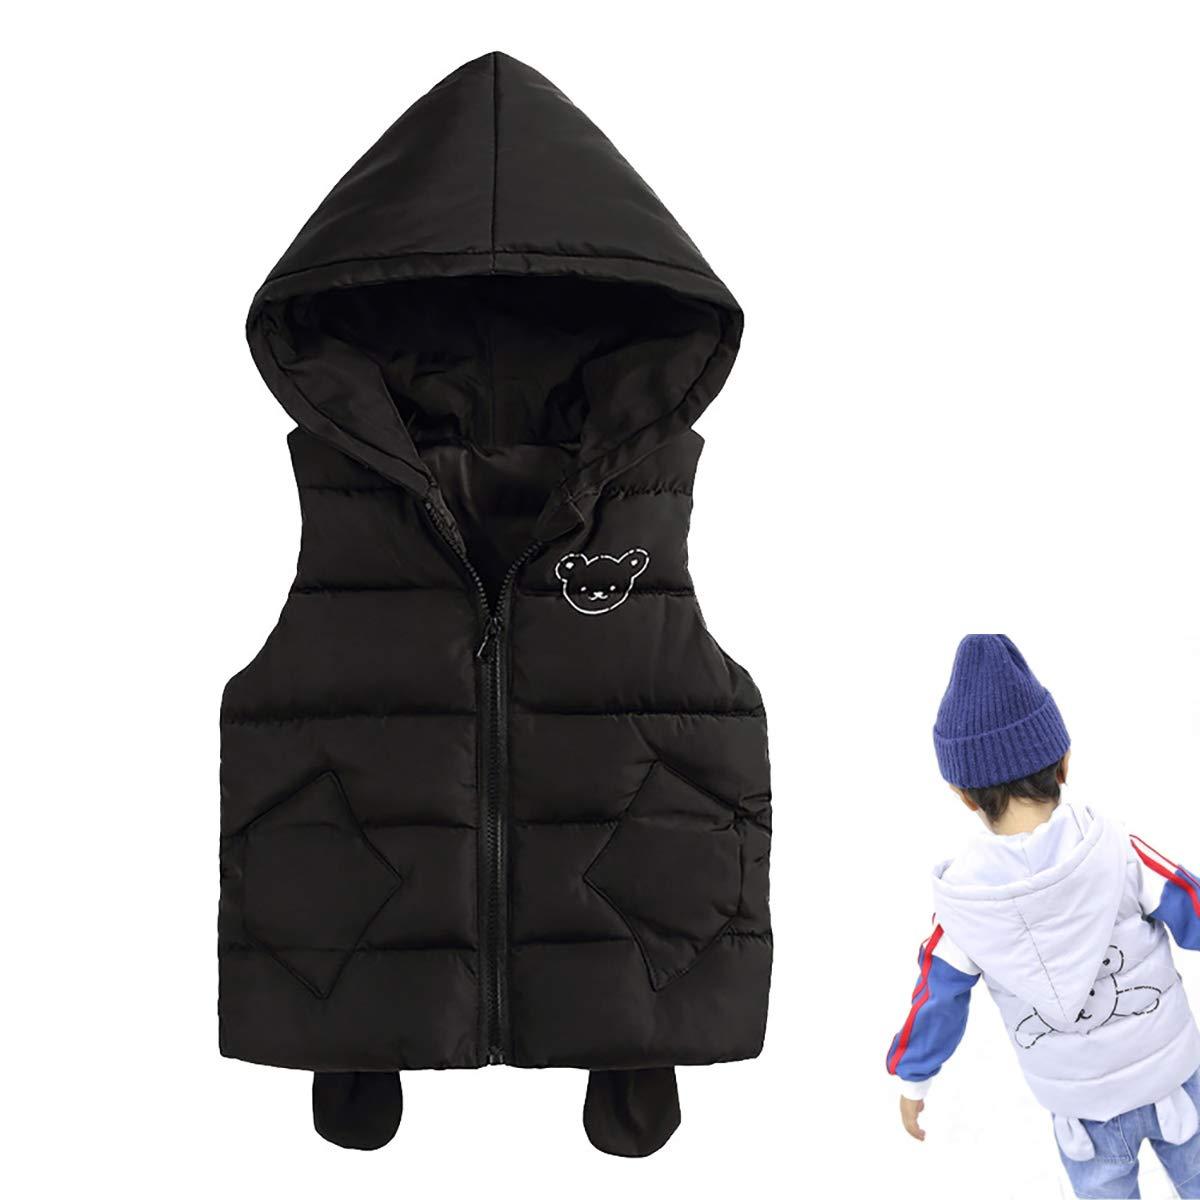 Baby Toddler Boy Girl Waistcoat Fall Winter Windproof Warm Jacket Coat 5-9 Y, Kid Cartoon Hooded Sleeveless Vest,Black,90cm by FASH